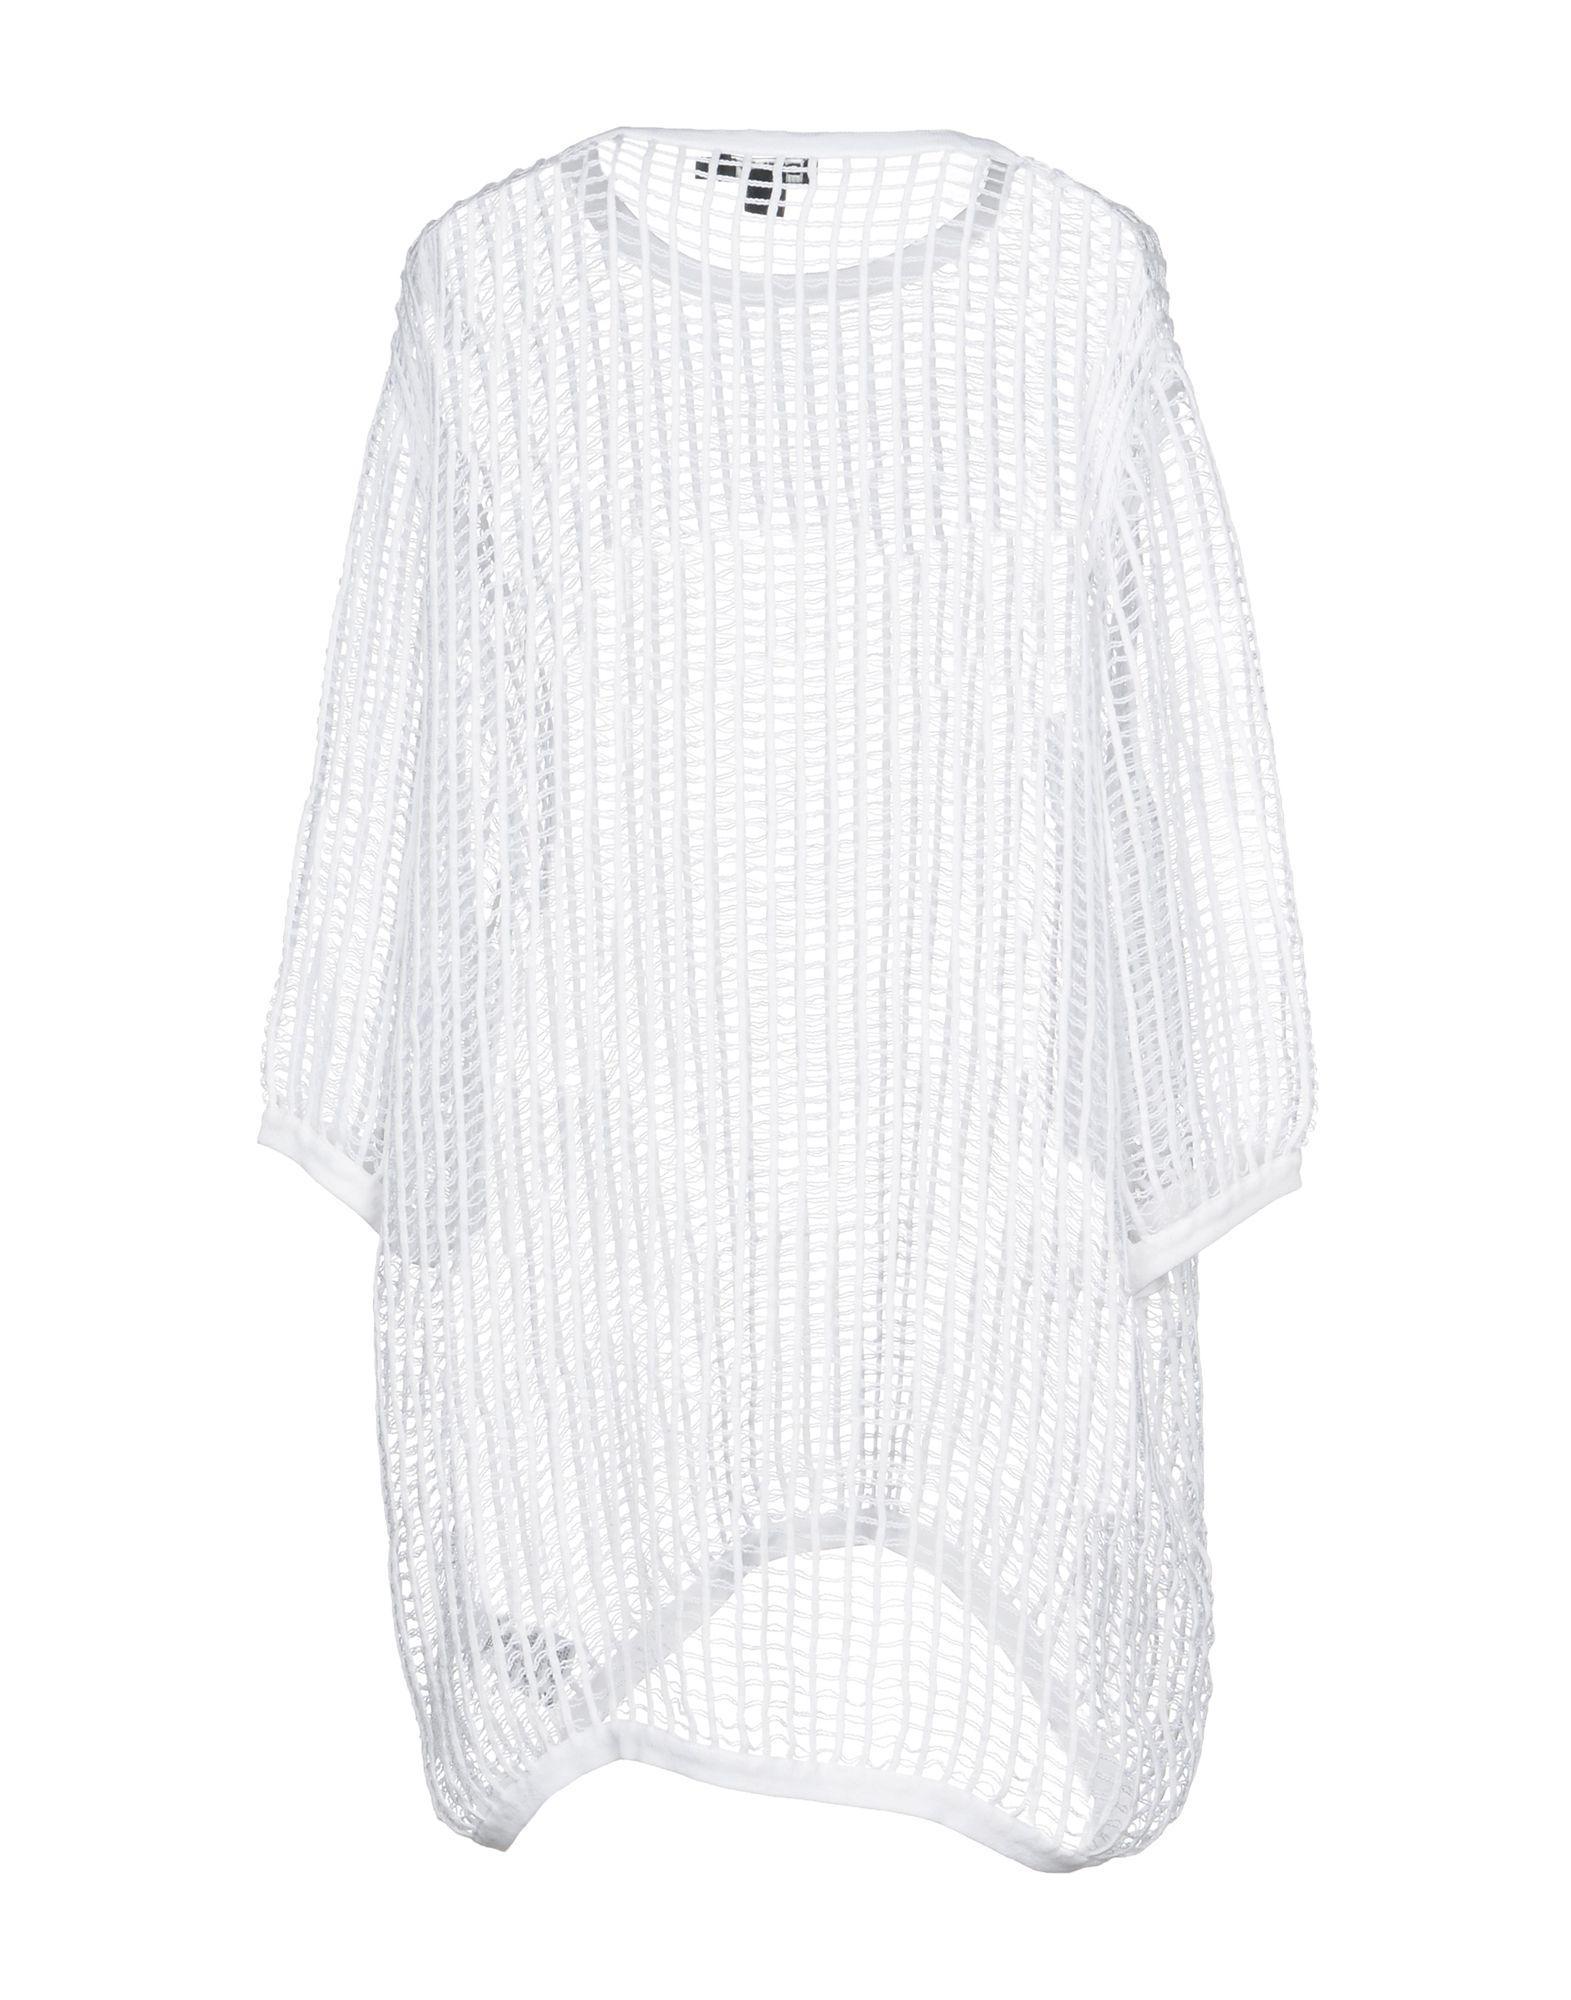 78c385ff5f8 Lyst - DKNY Jumper in White